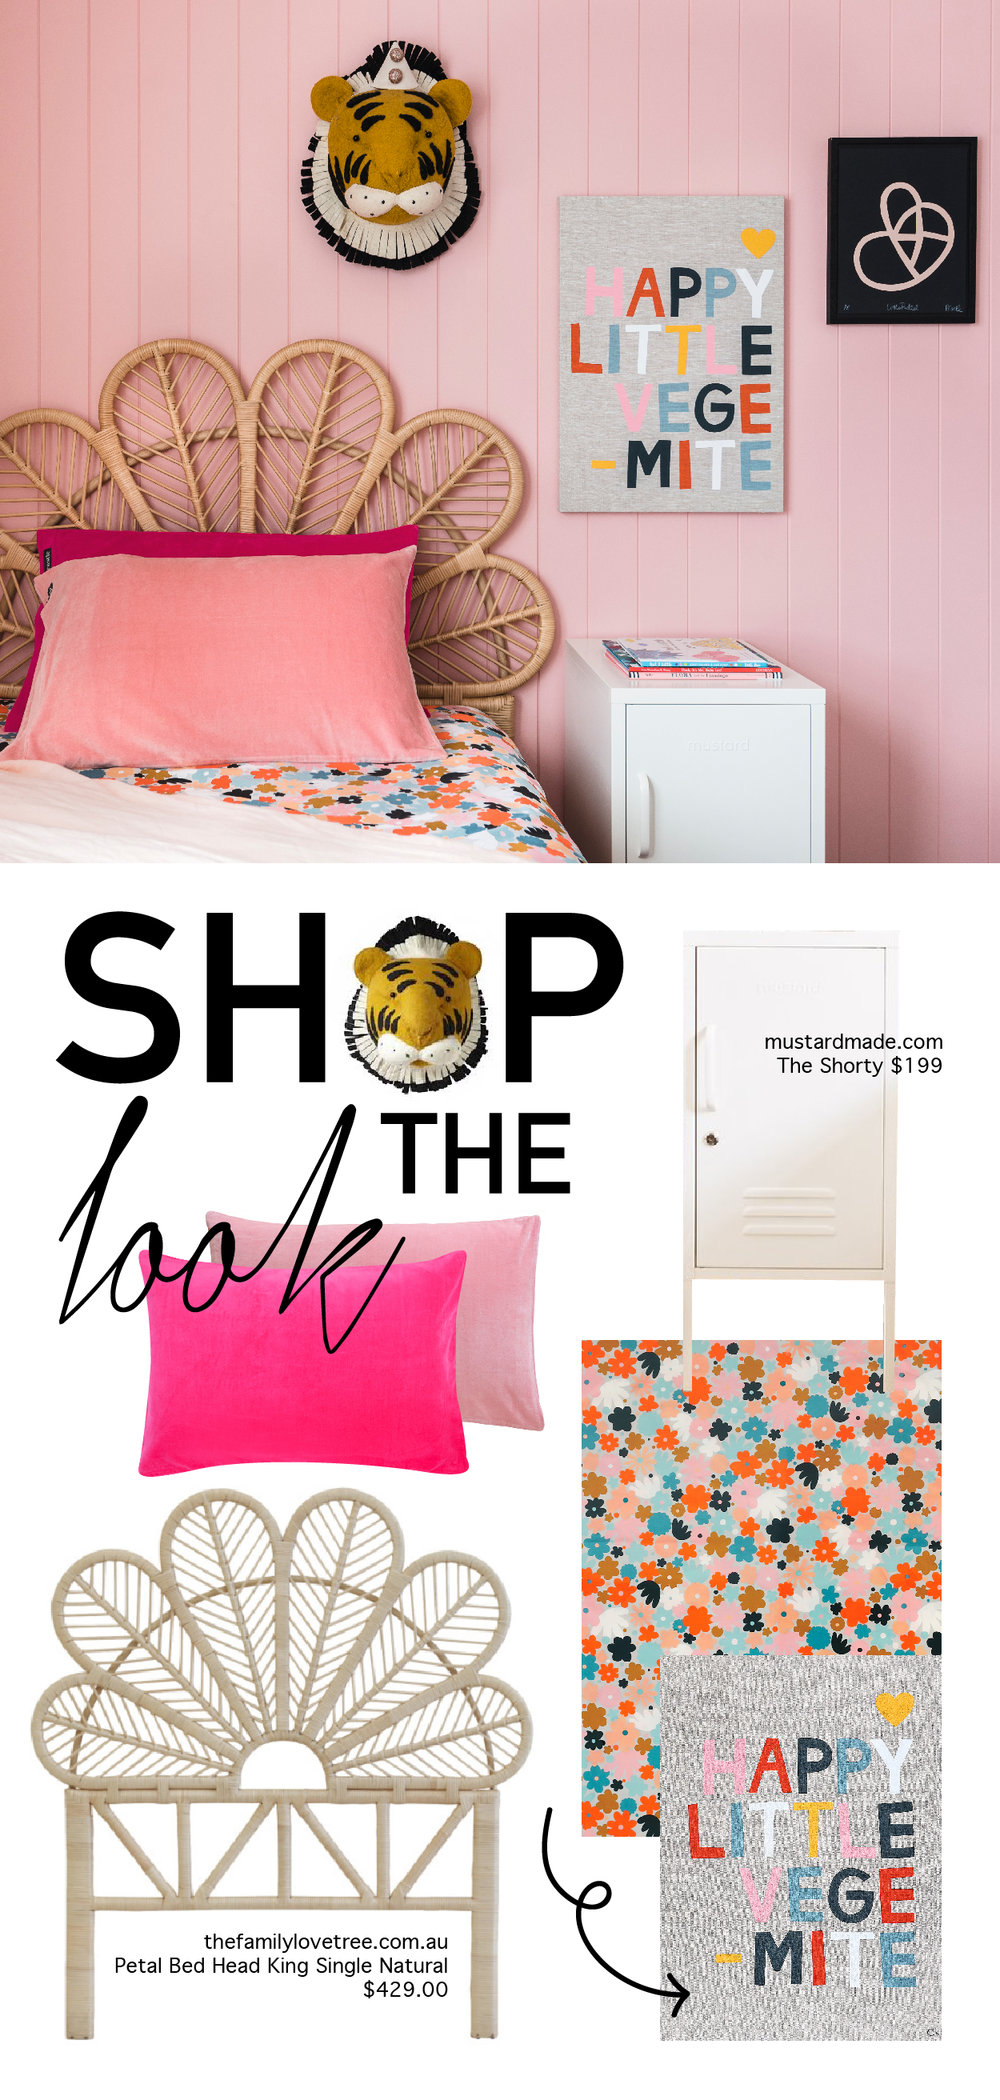 Shopthelook-Bold-01.jpg